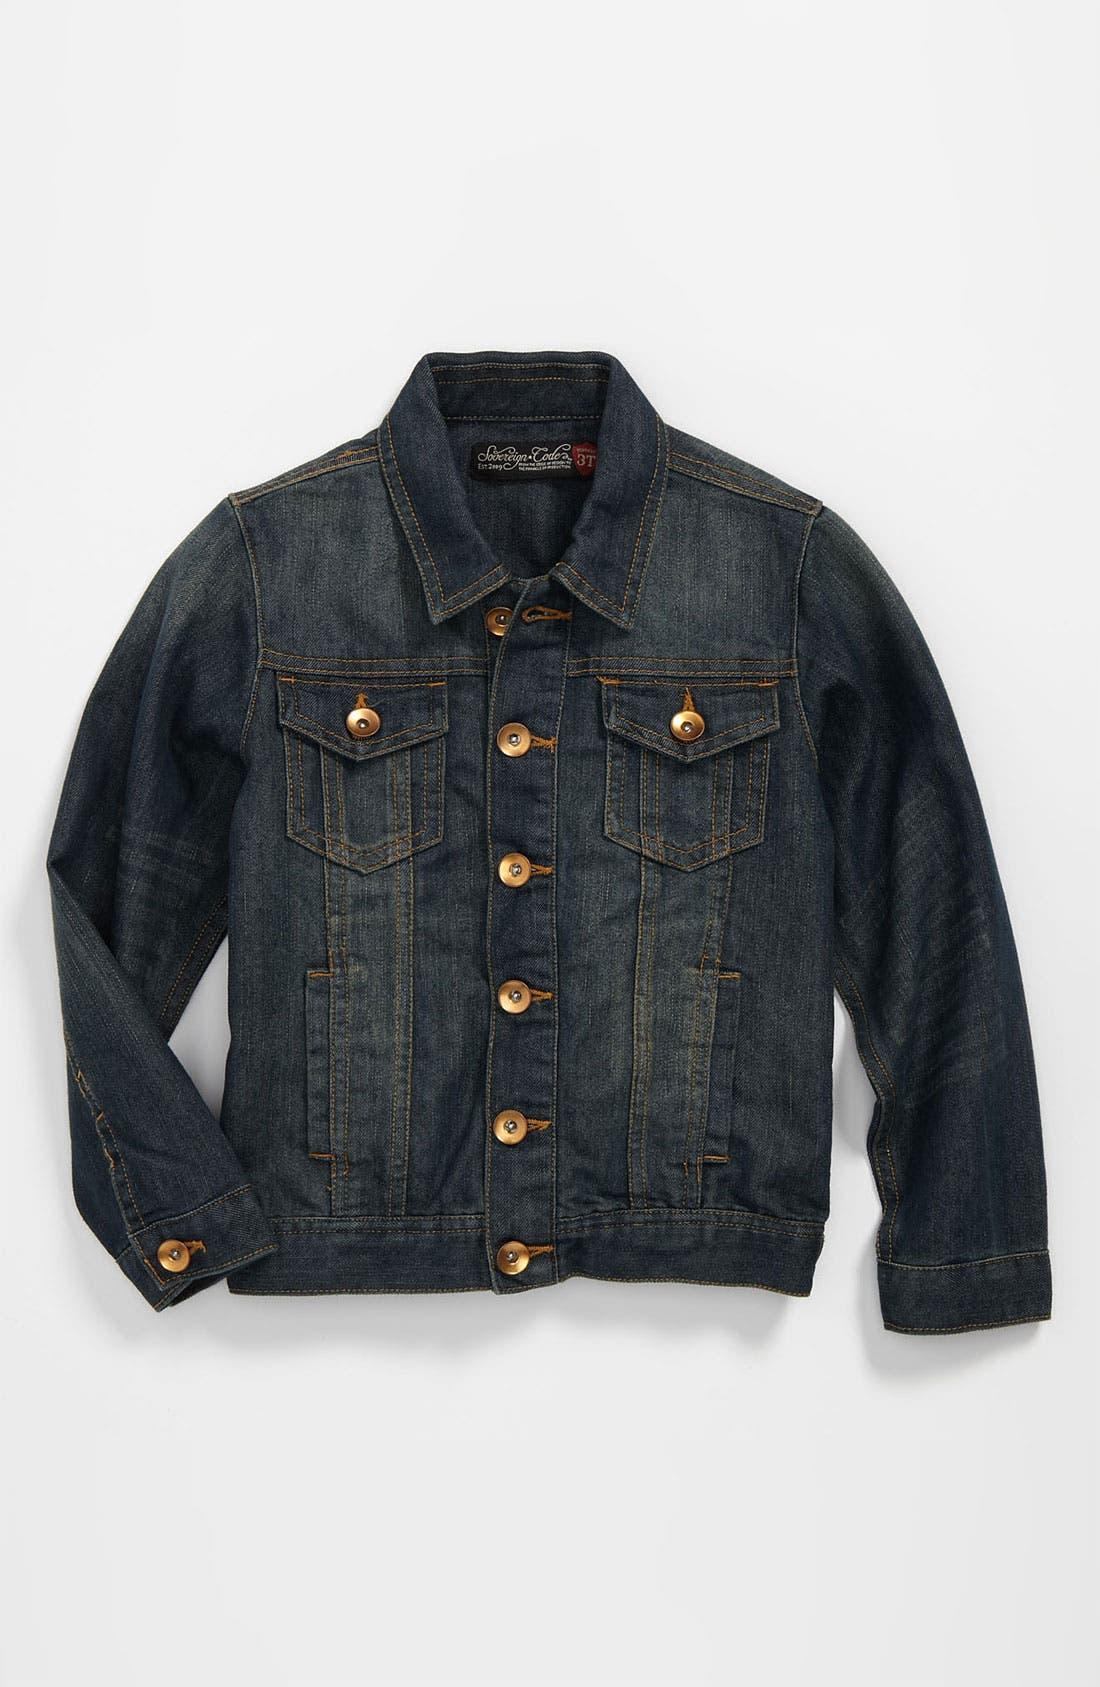 Alternate Image 1 Selected - Sovereign Code 'Dashing' Denim Jacket (Toddler)